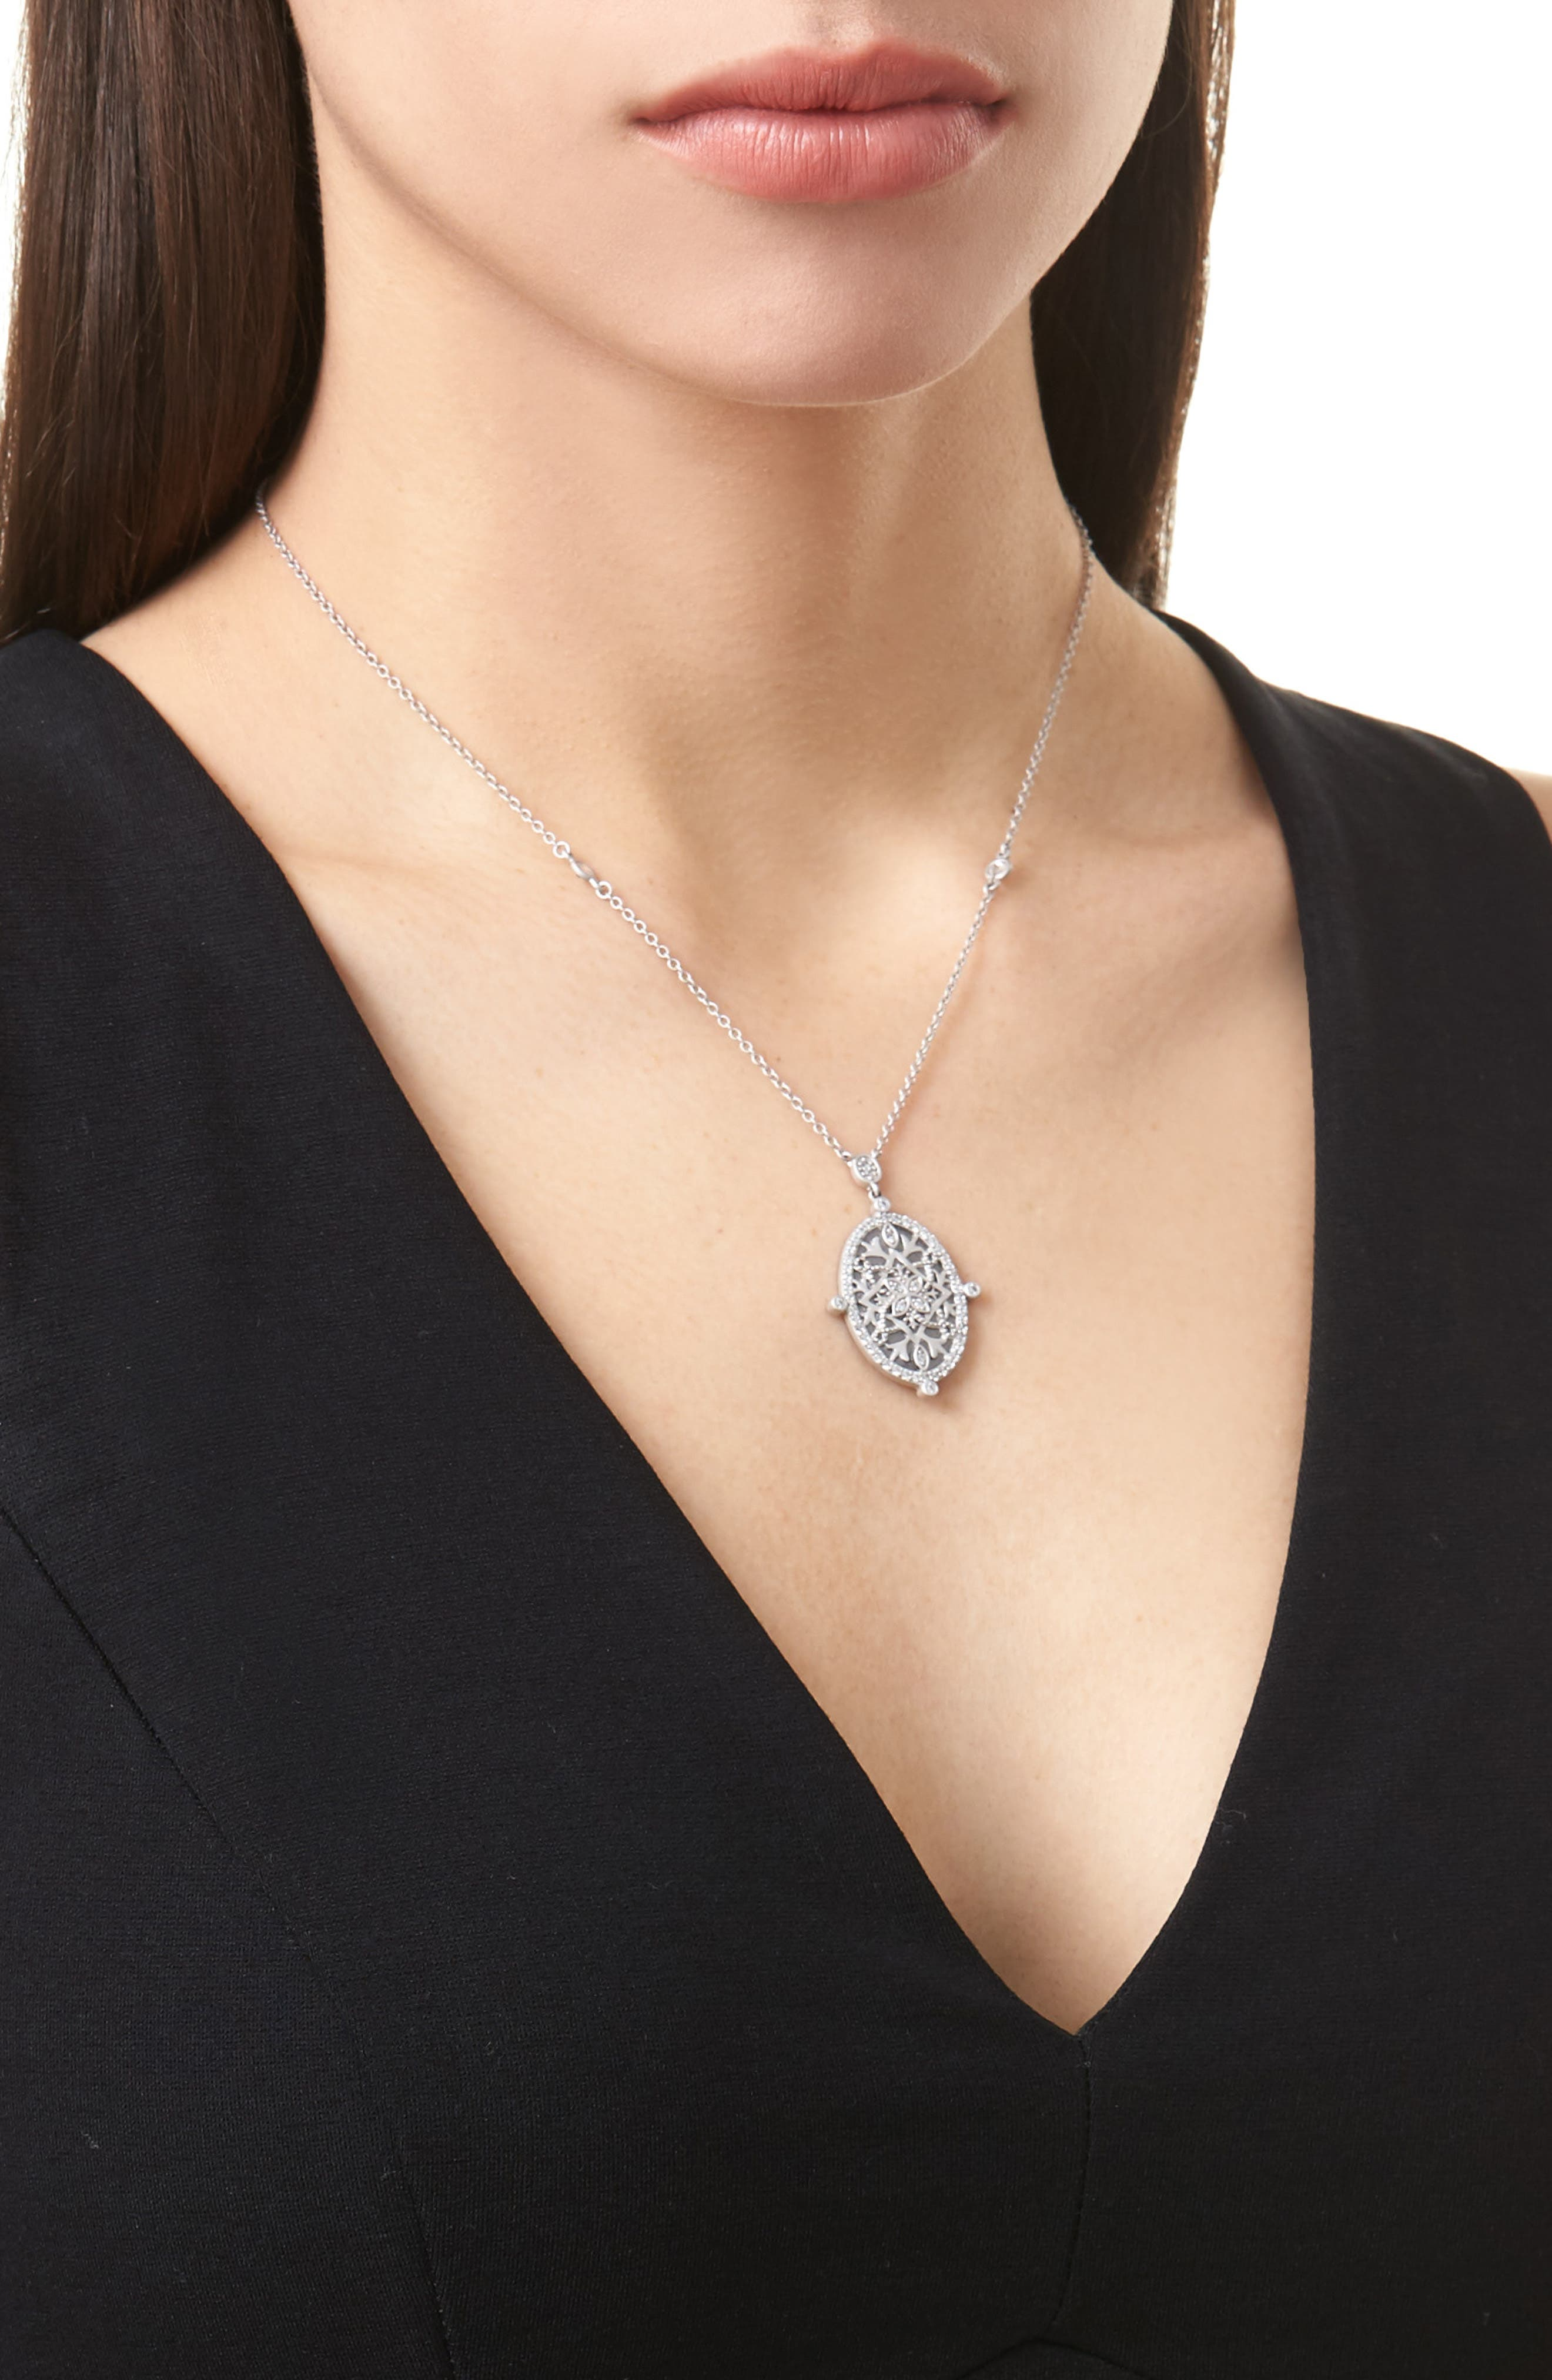 Contemporary Deco Celestial Pendant Necklace,                             Alternate thumbnail 2, color,                             Silver/ Black